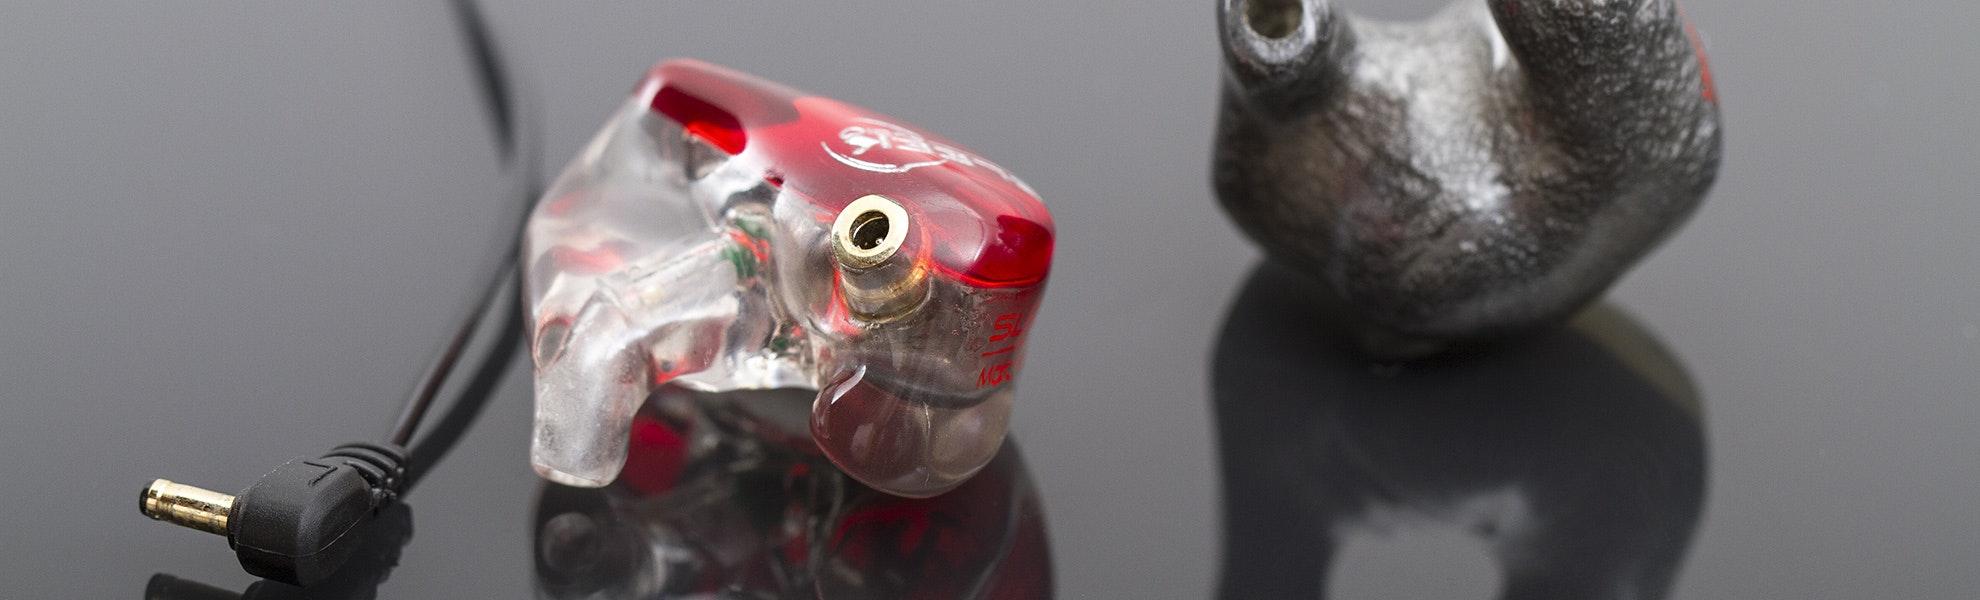 Sleek Audio CT7 Custom IEM